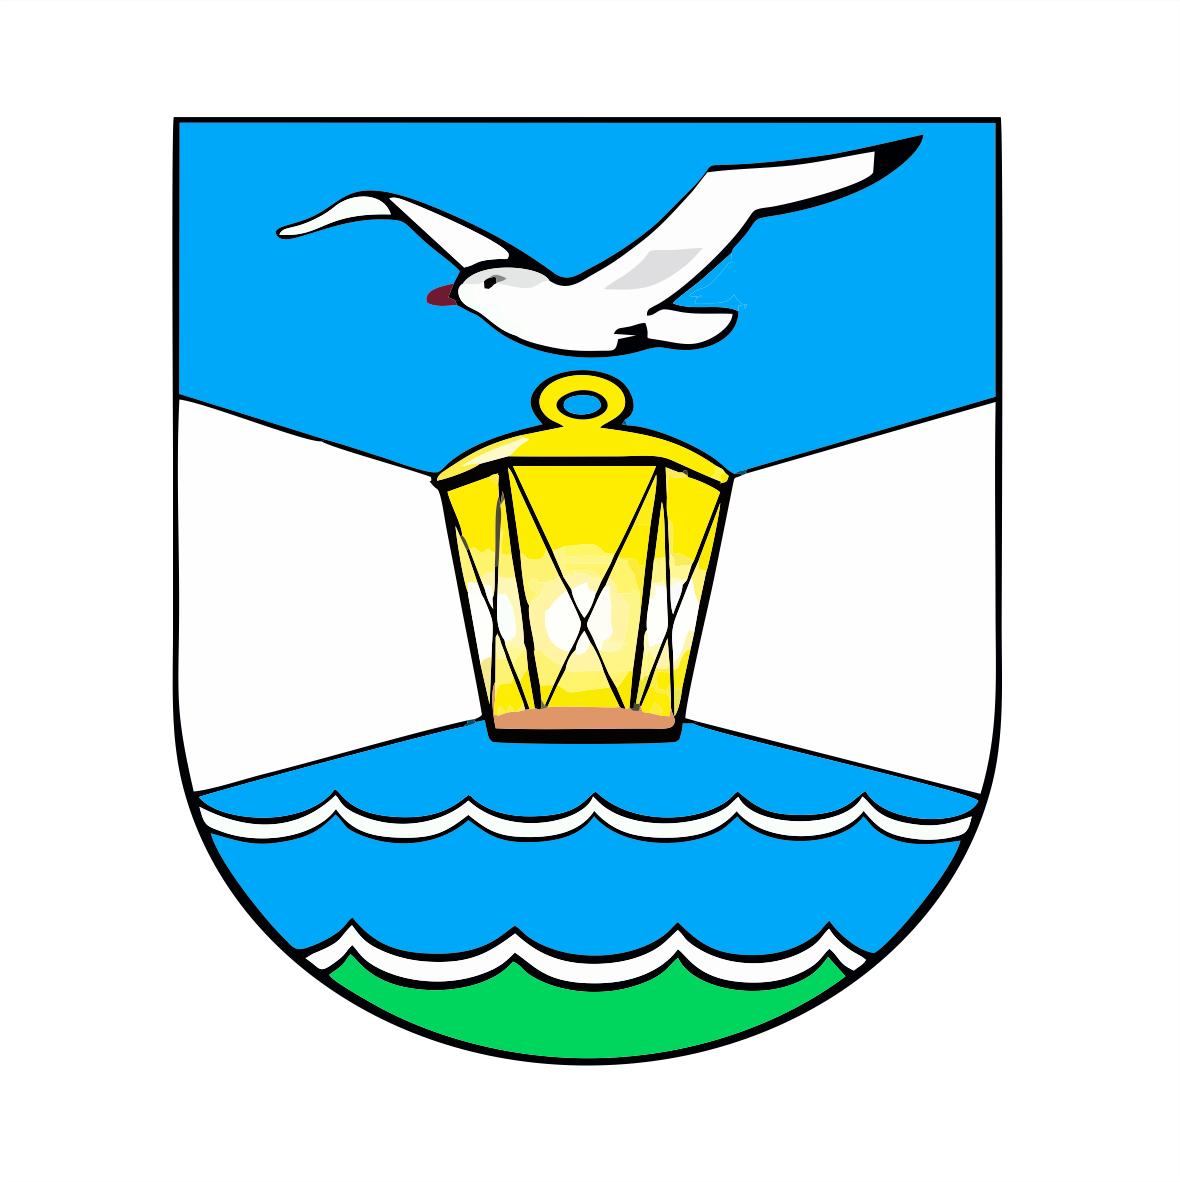 Спортивная школа олимпийского резерва города Светлый